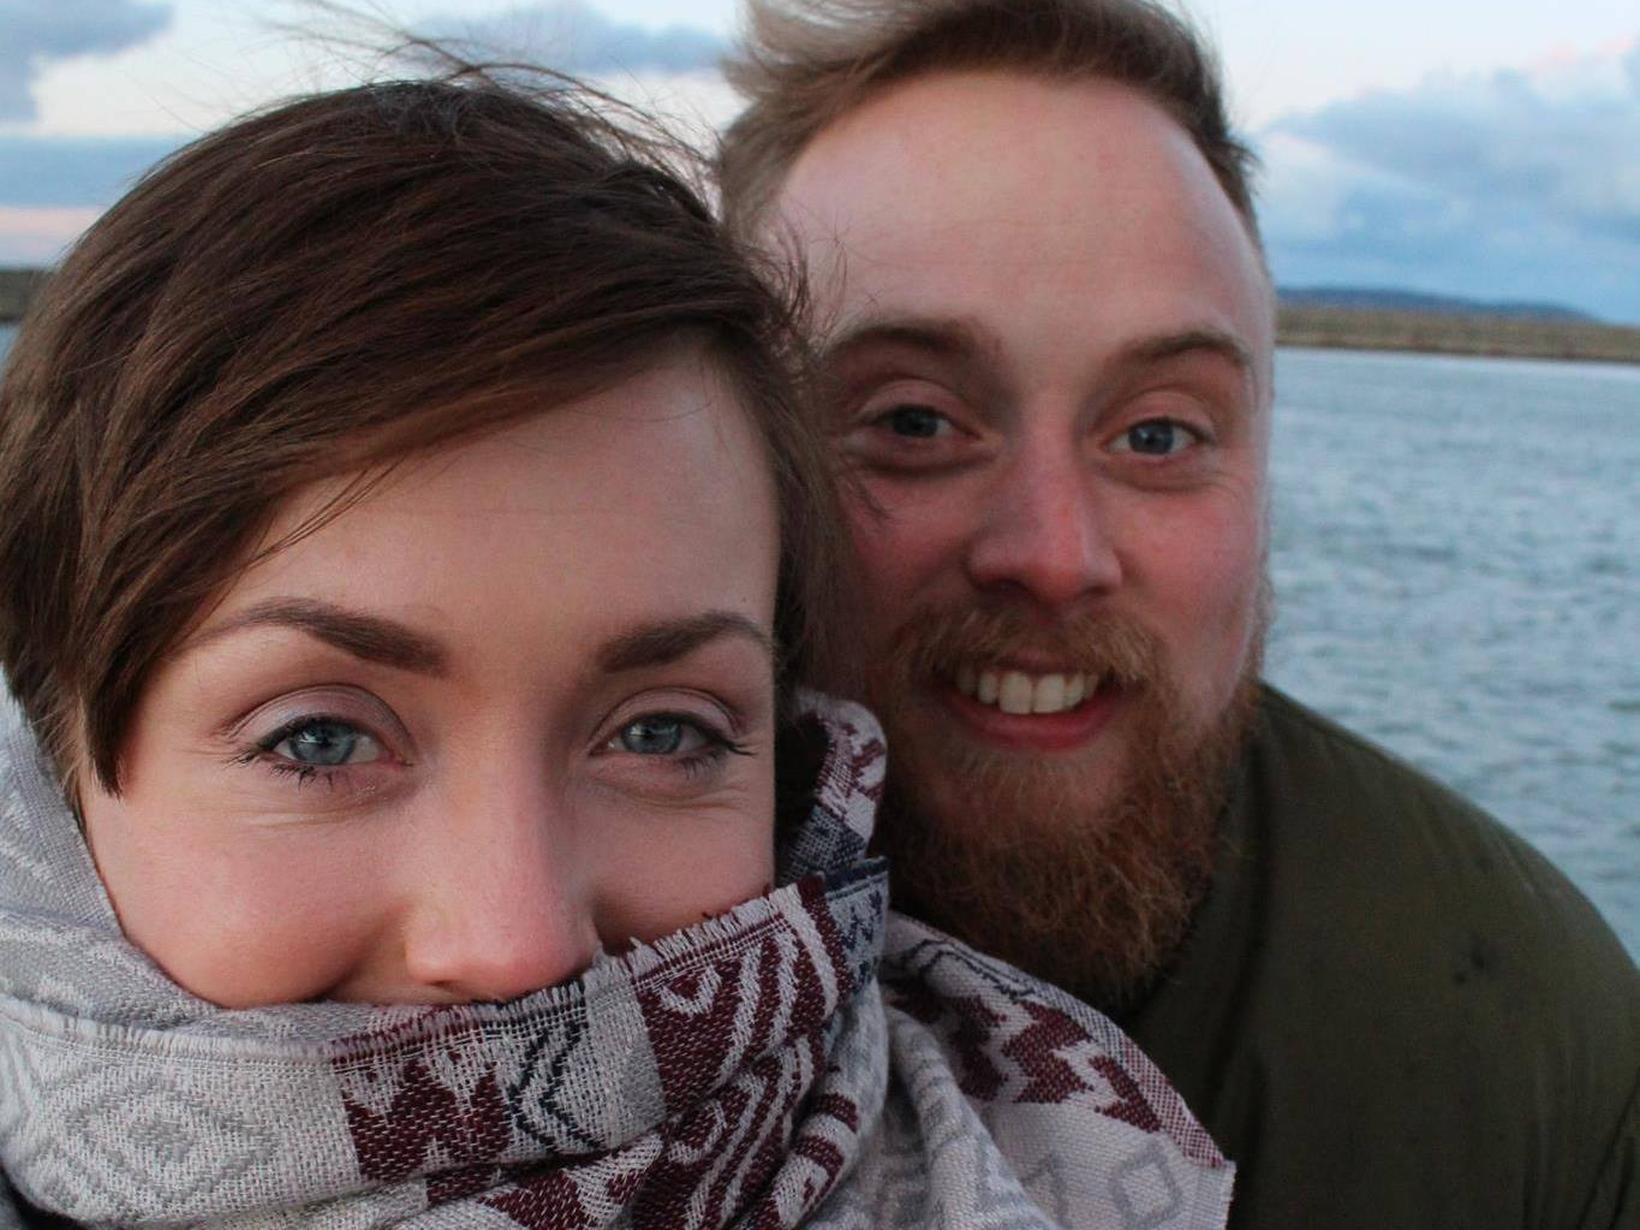 Corinne & Dean from Dublin, Ireland